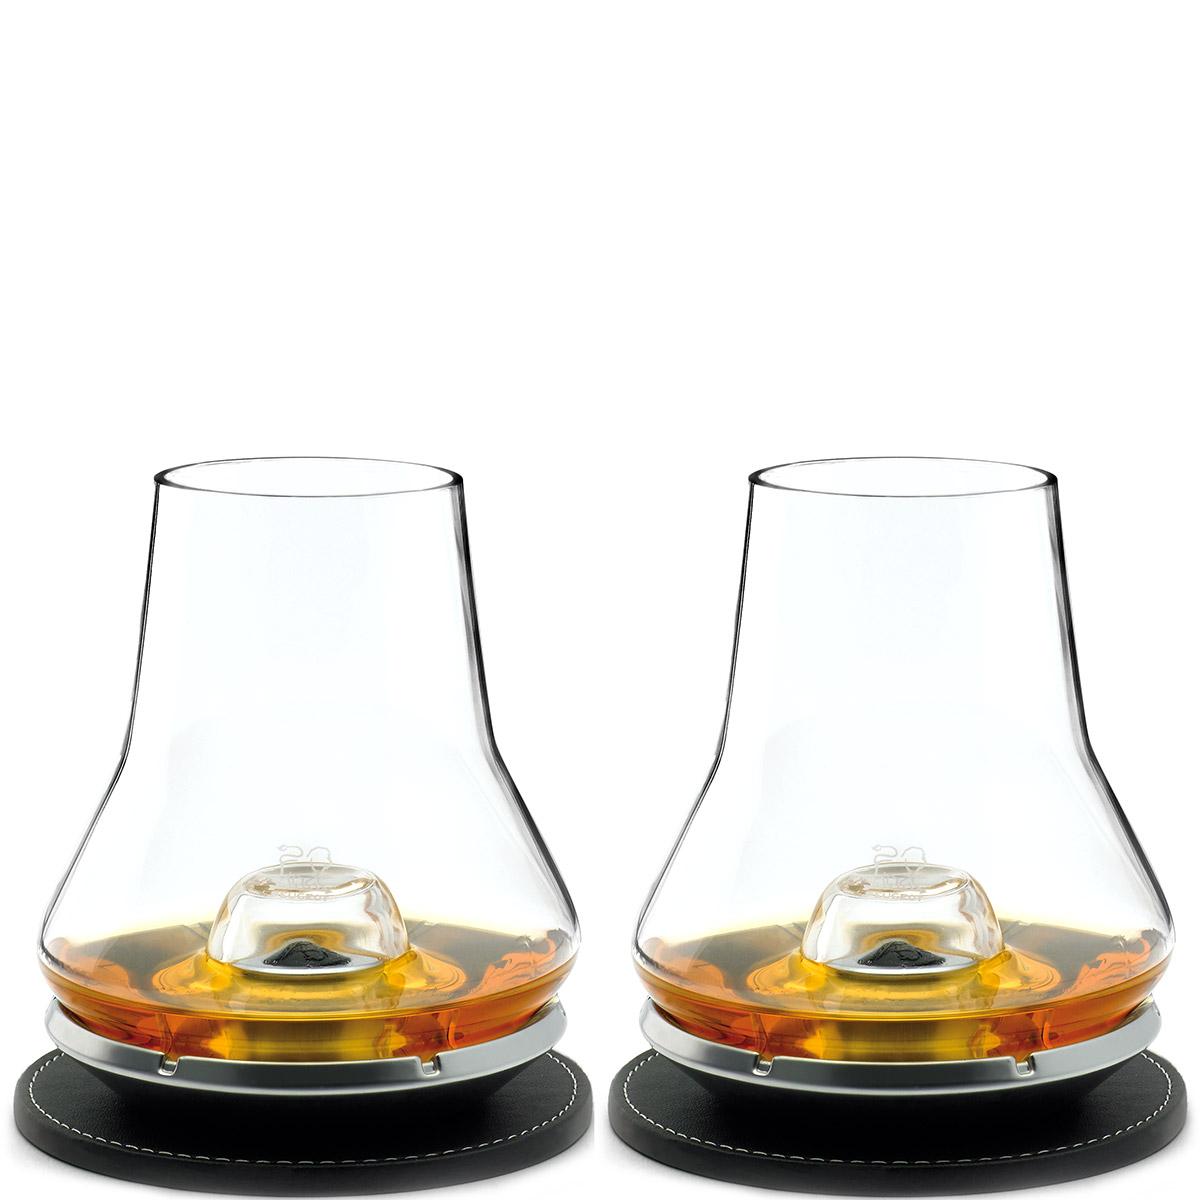 Zestaw Prezentowy Do Degustacji Whisky Les Impitoyables Peugeot